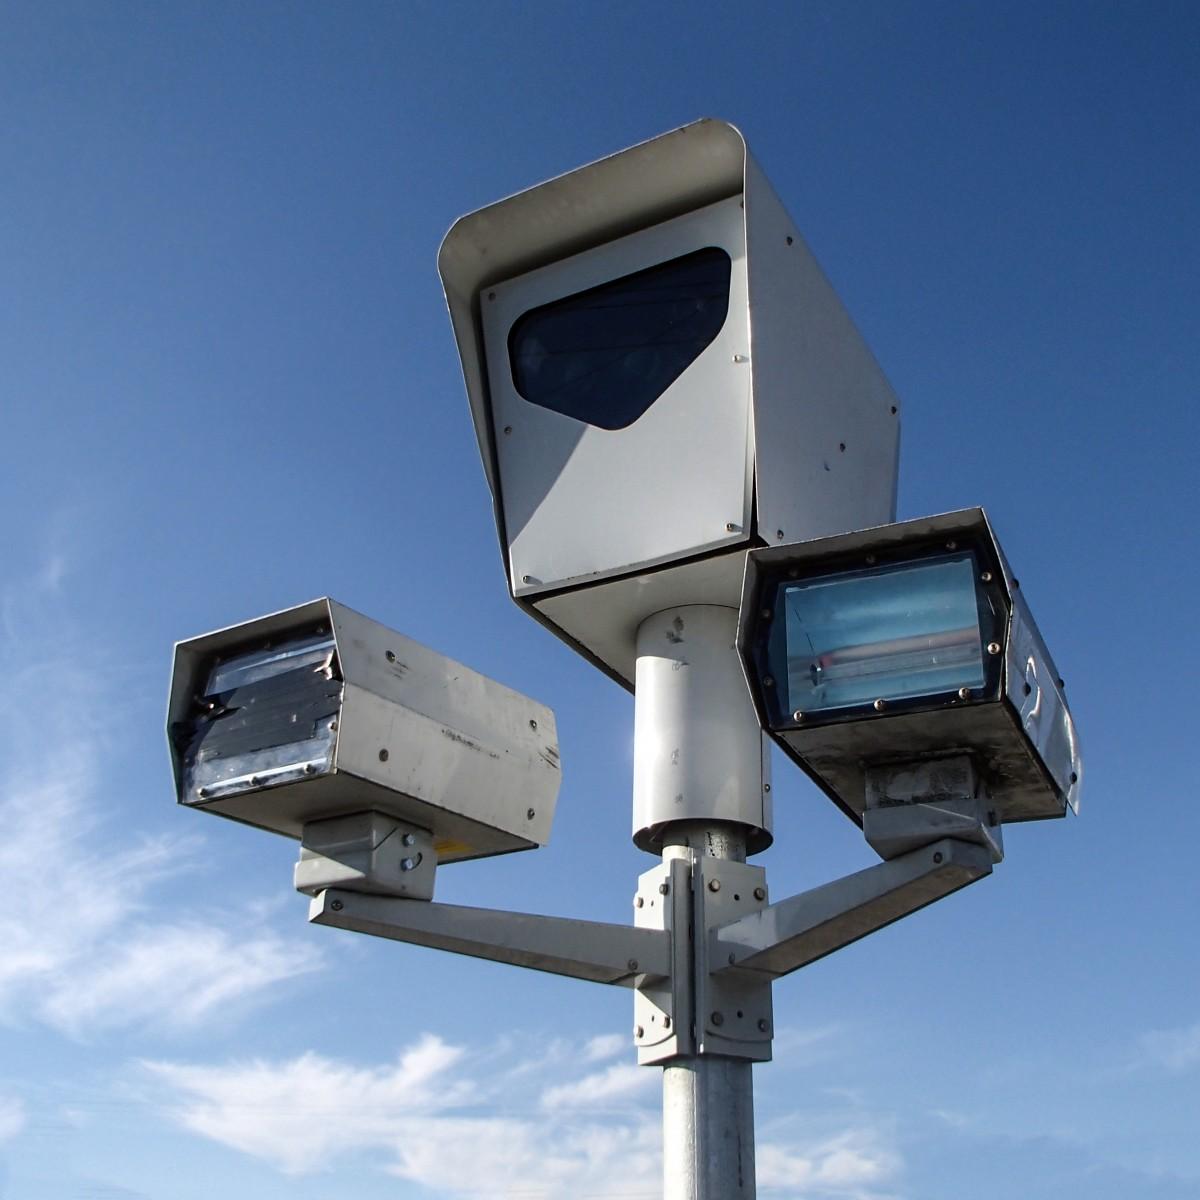 Camera Light Fixture: Free Images : Machine, Street Light, Lighting, Traffic